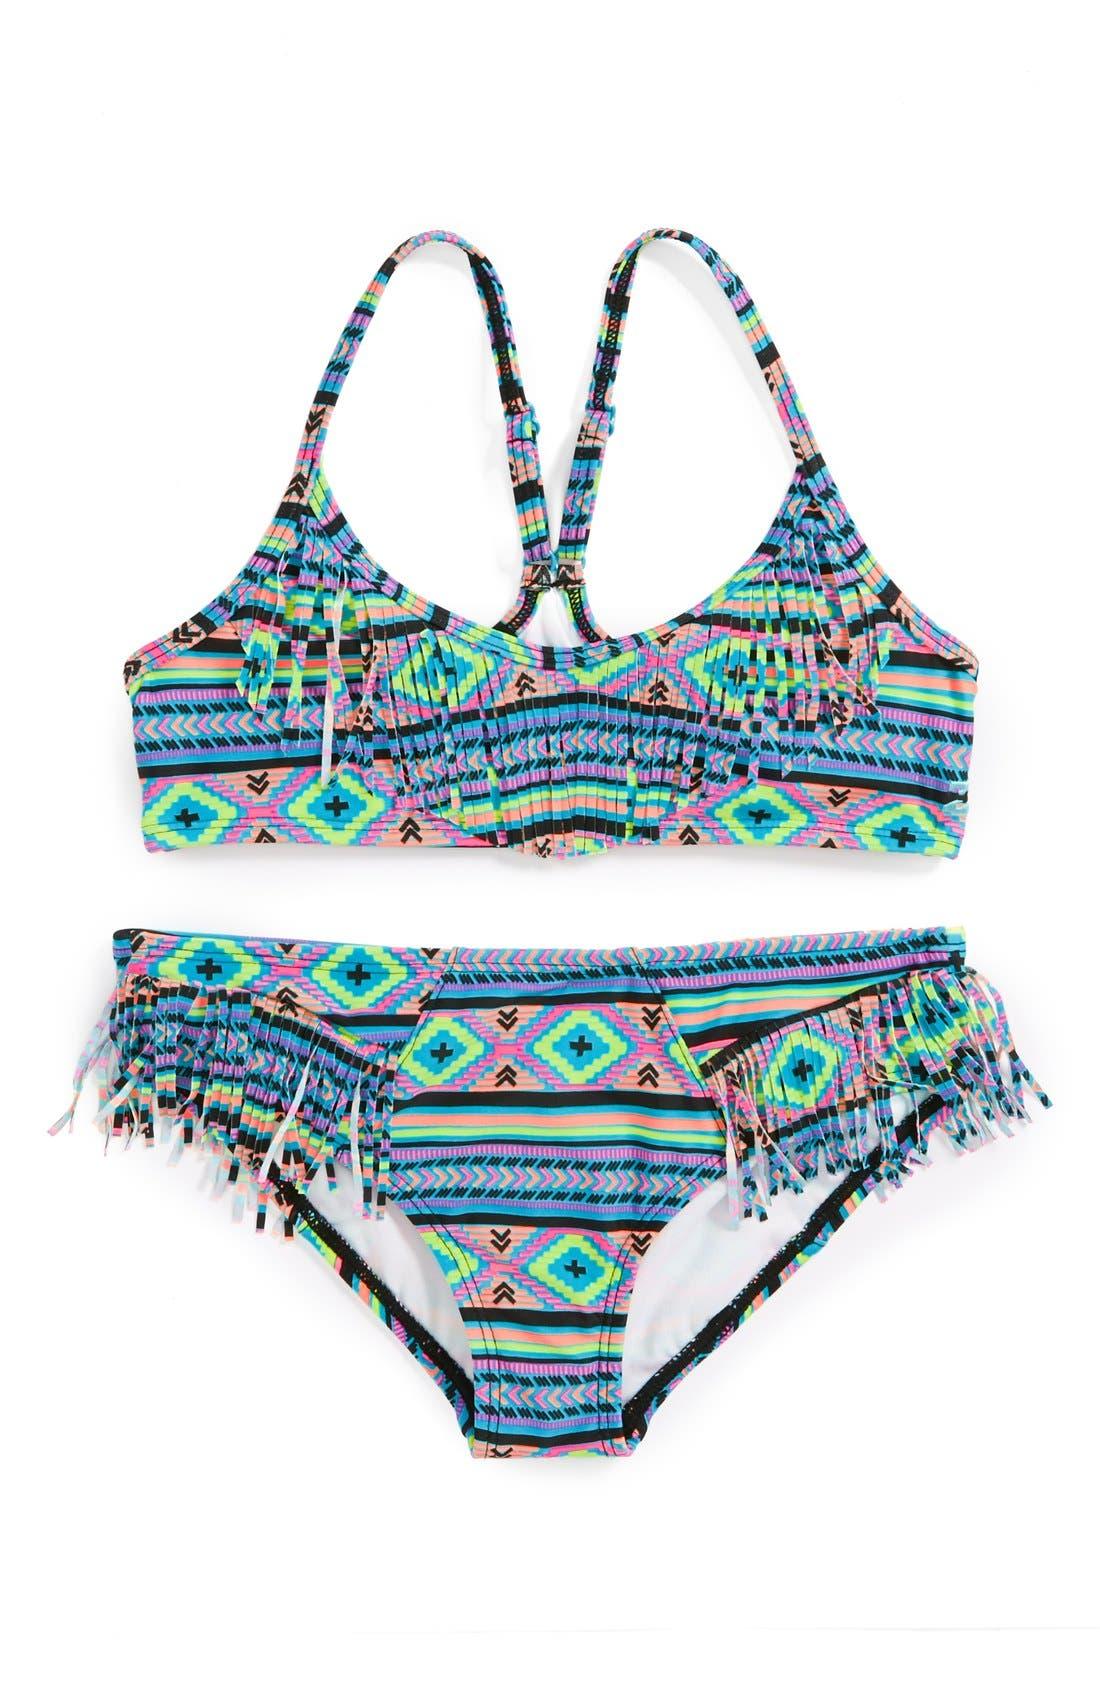 Main Image - Billabong 'Heat Wave' Racerback Two-Piece Swimsuit (Little Girls)(Online Only)